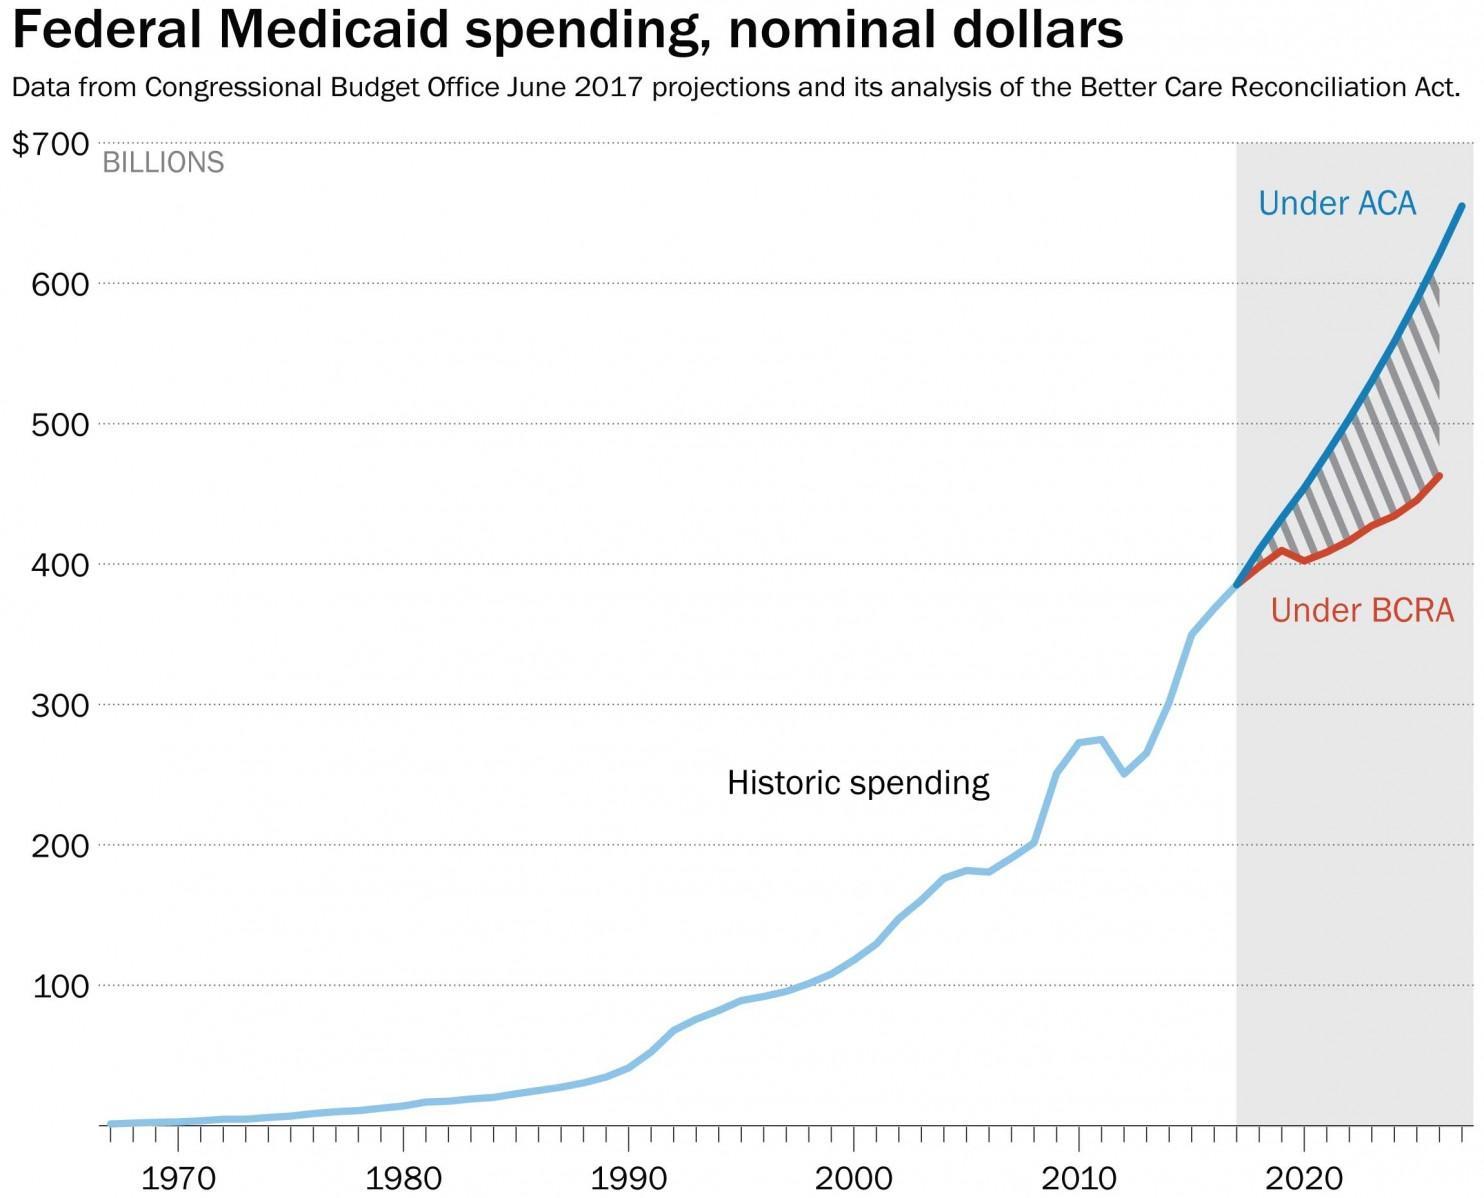 https://img.washingtonpost.com/wp-apps/imrs.php?src=https://img.washingtonpost.com/news/politics/wp-content/uploads/sites/11/2017/06/Medicaid_Nomv2.jpg&w=1484